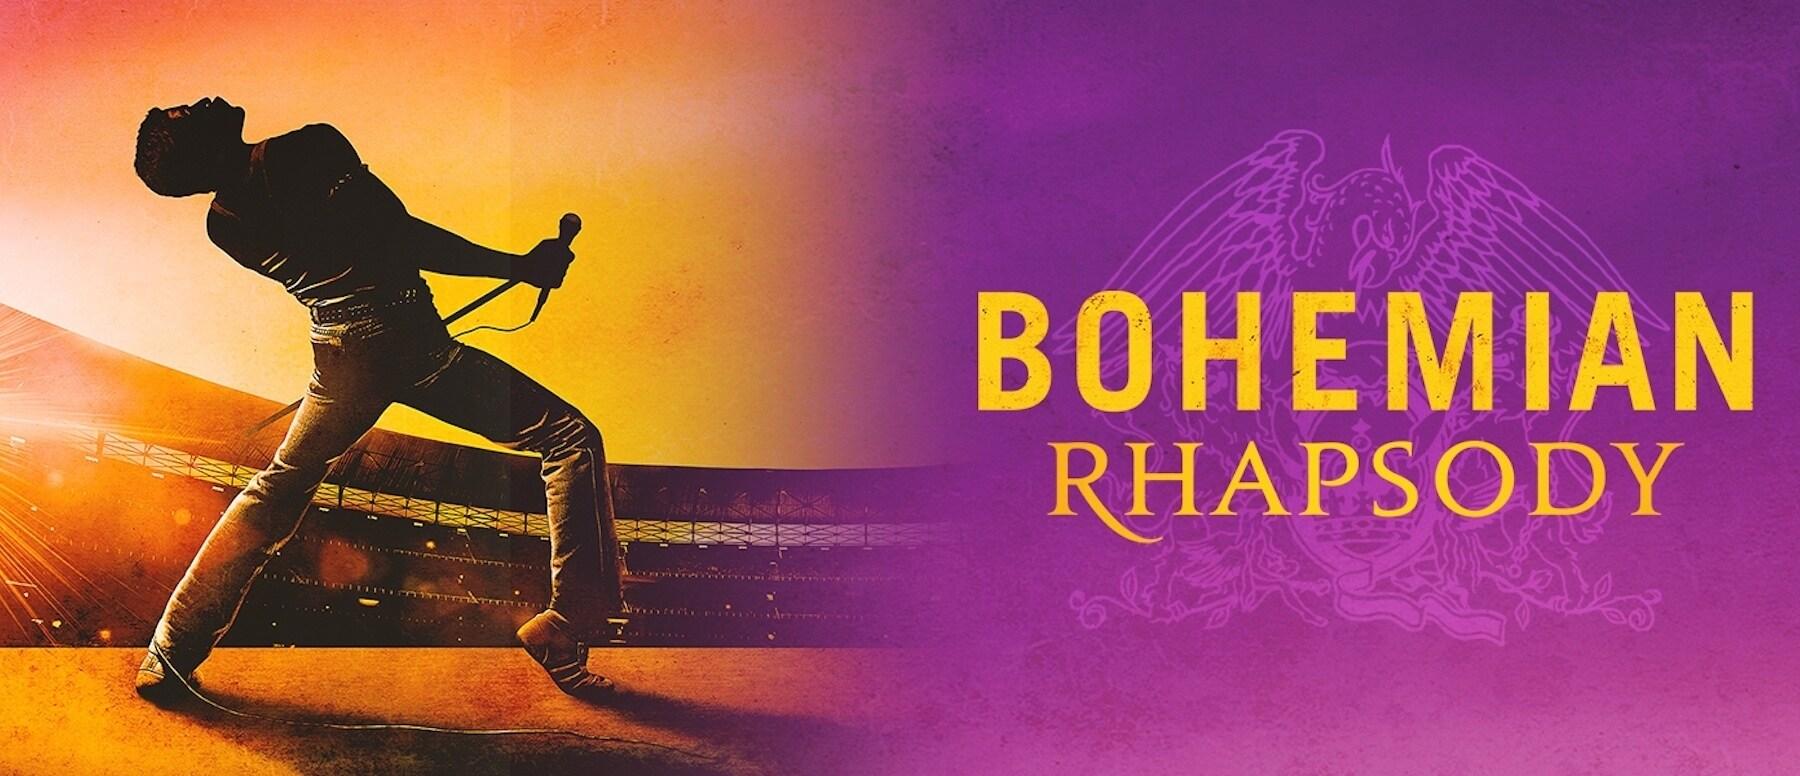 Bohemian Rhapsody Hero